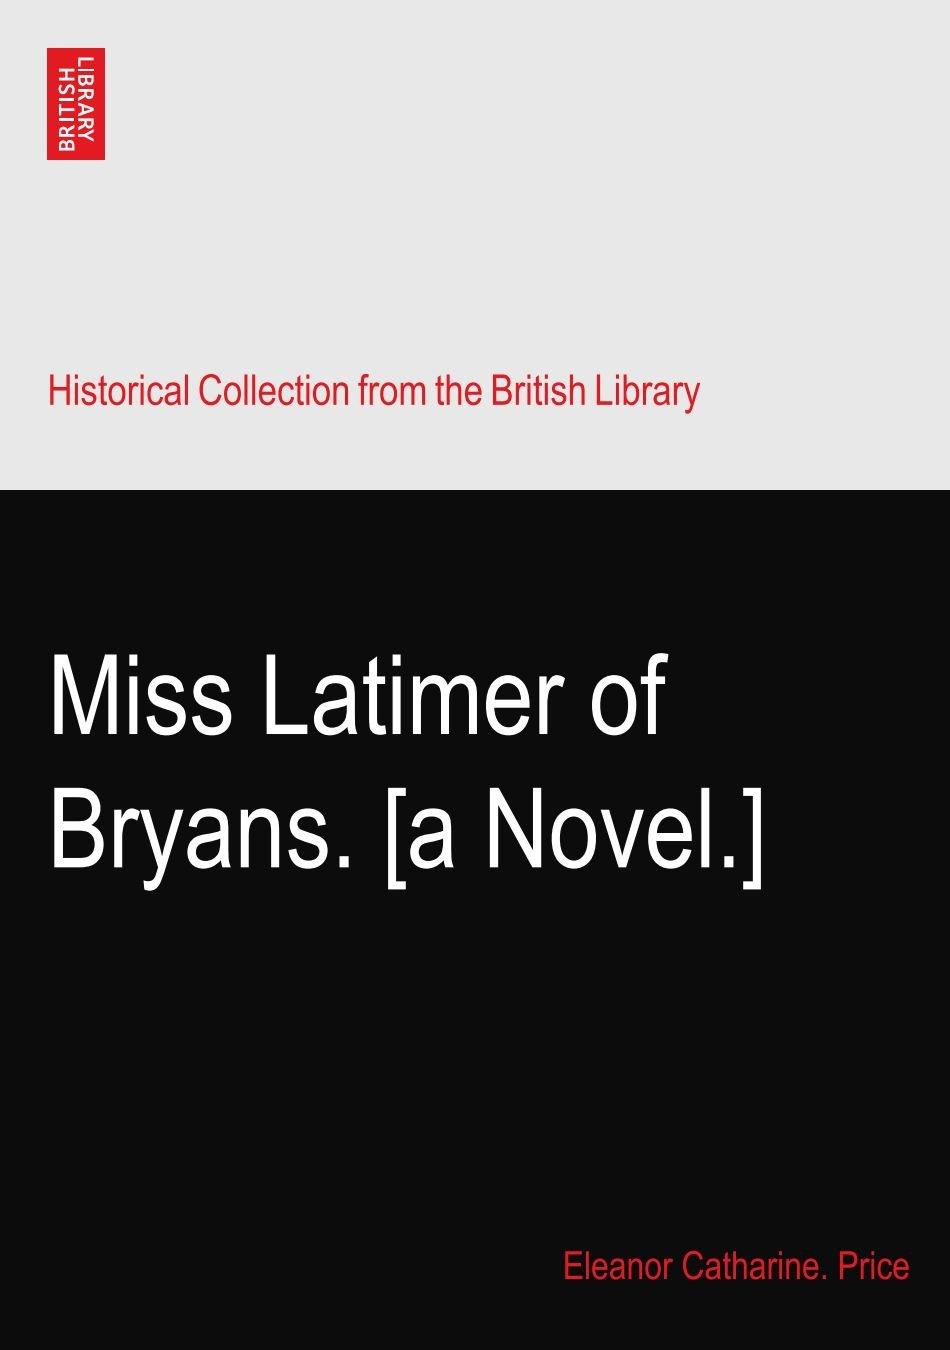 Miss Latimer of Bryans. [a Novel.] ebook